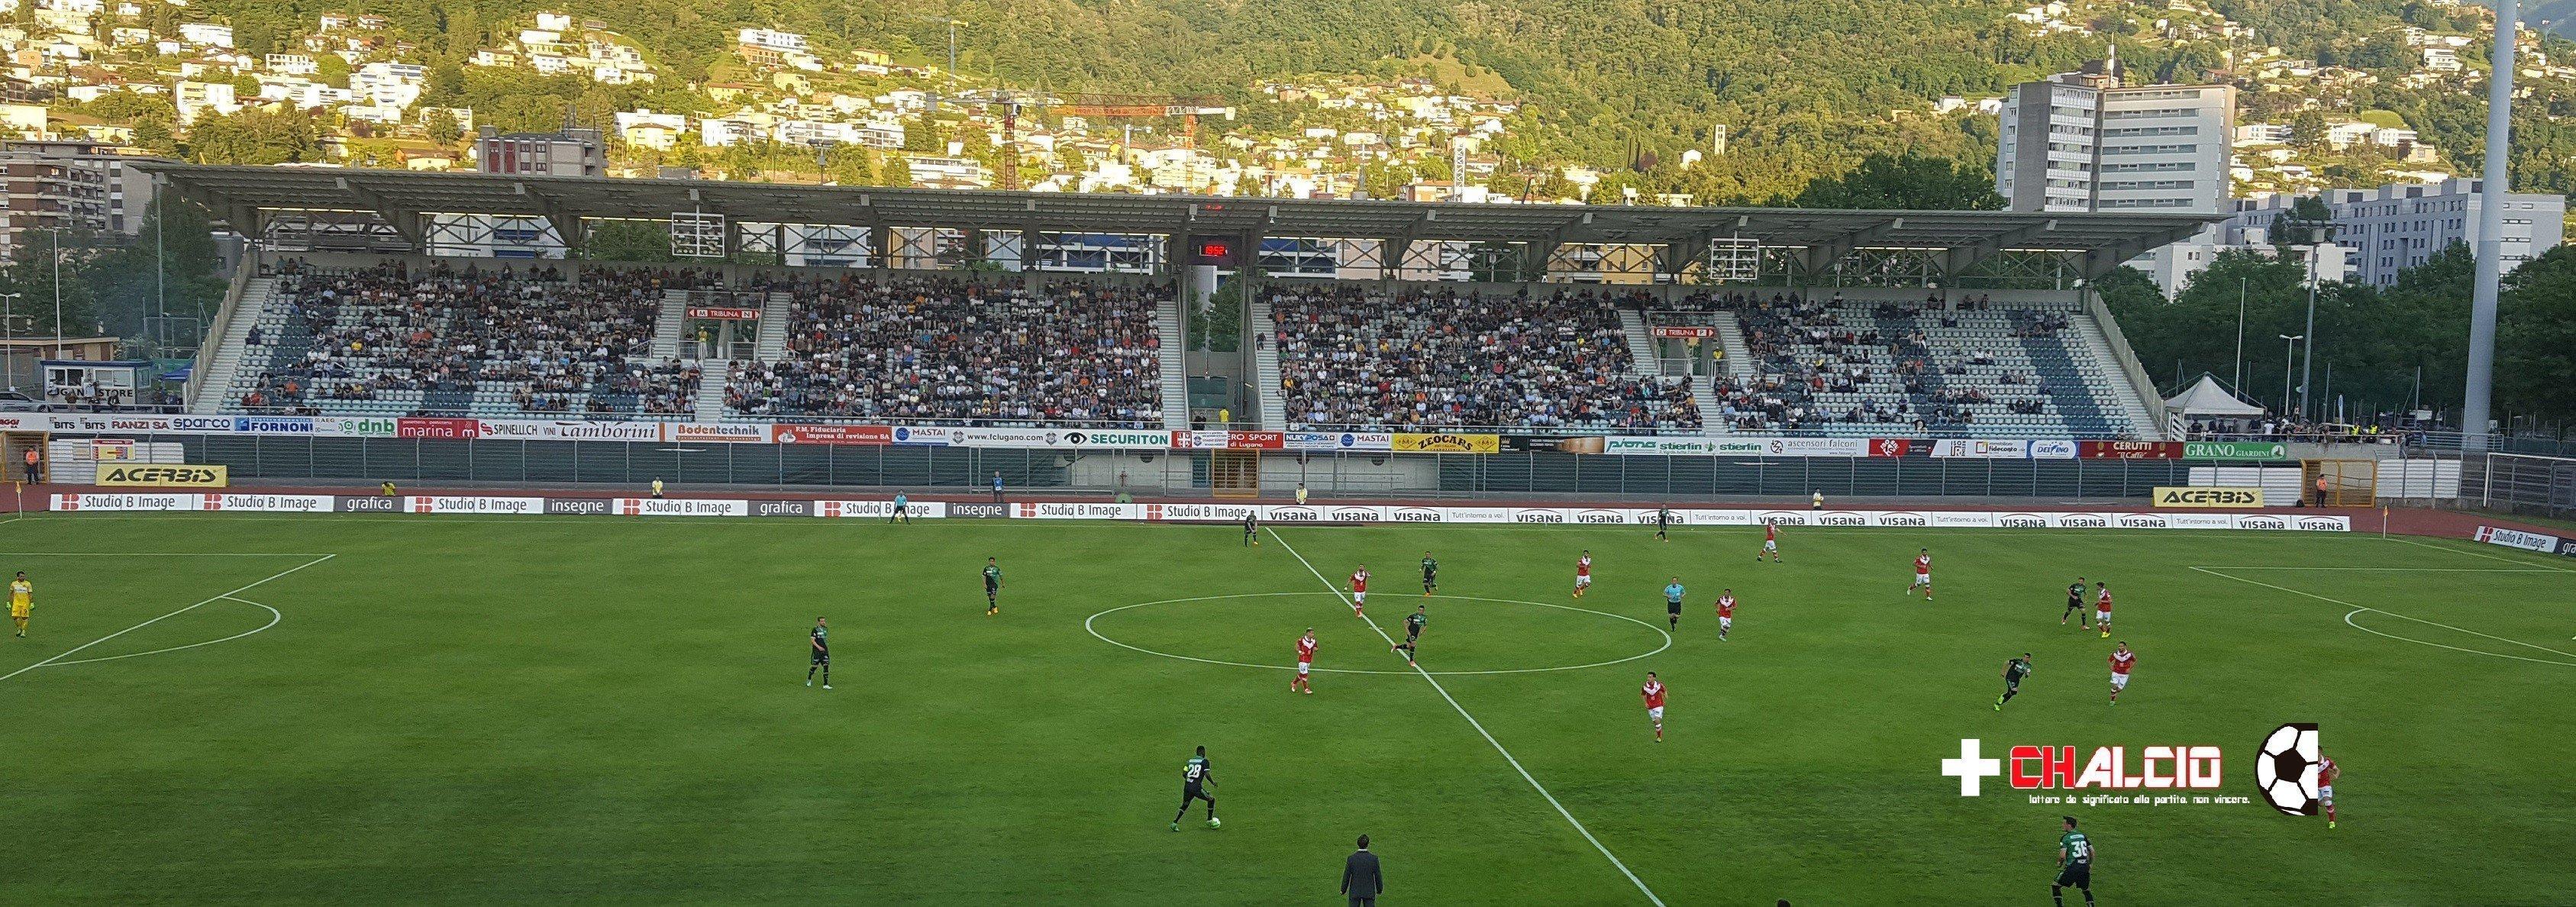 SL: la preview Lugano – Vaduz